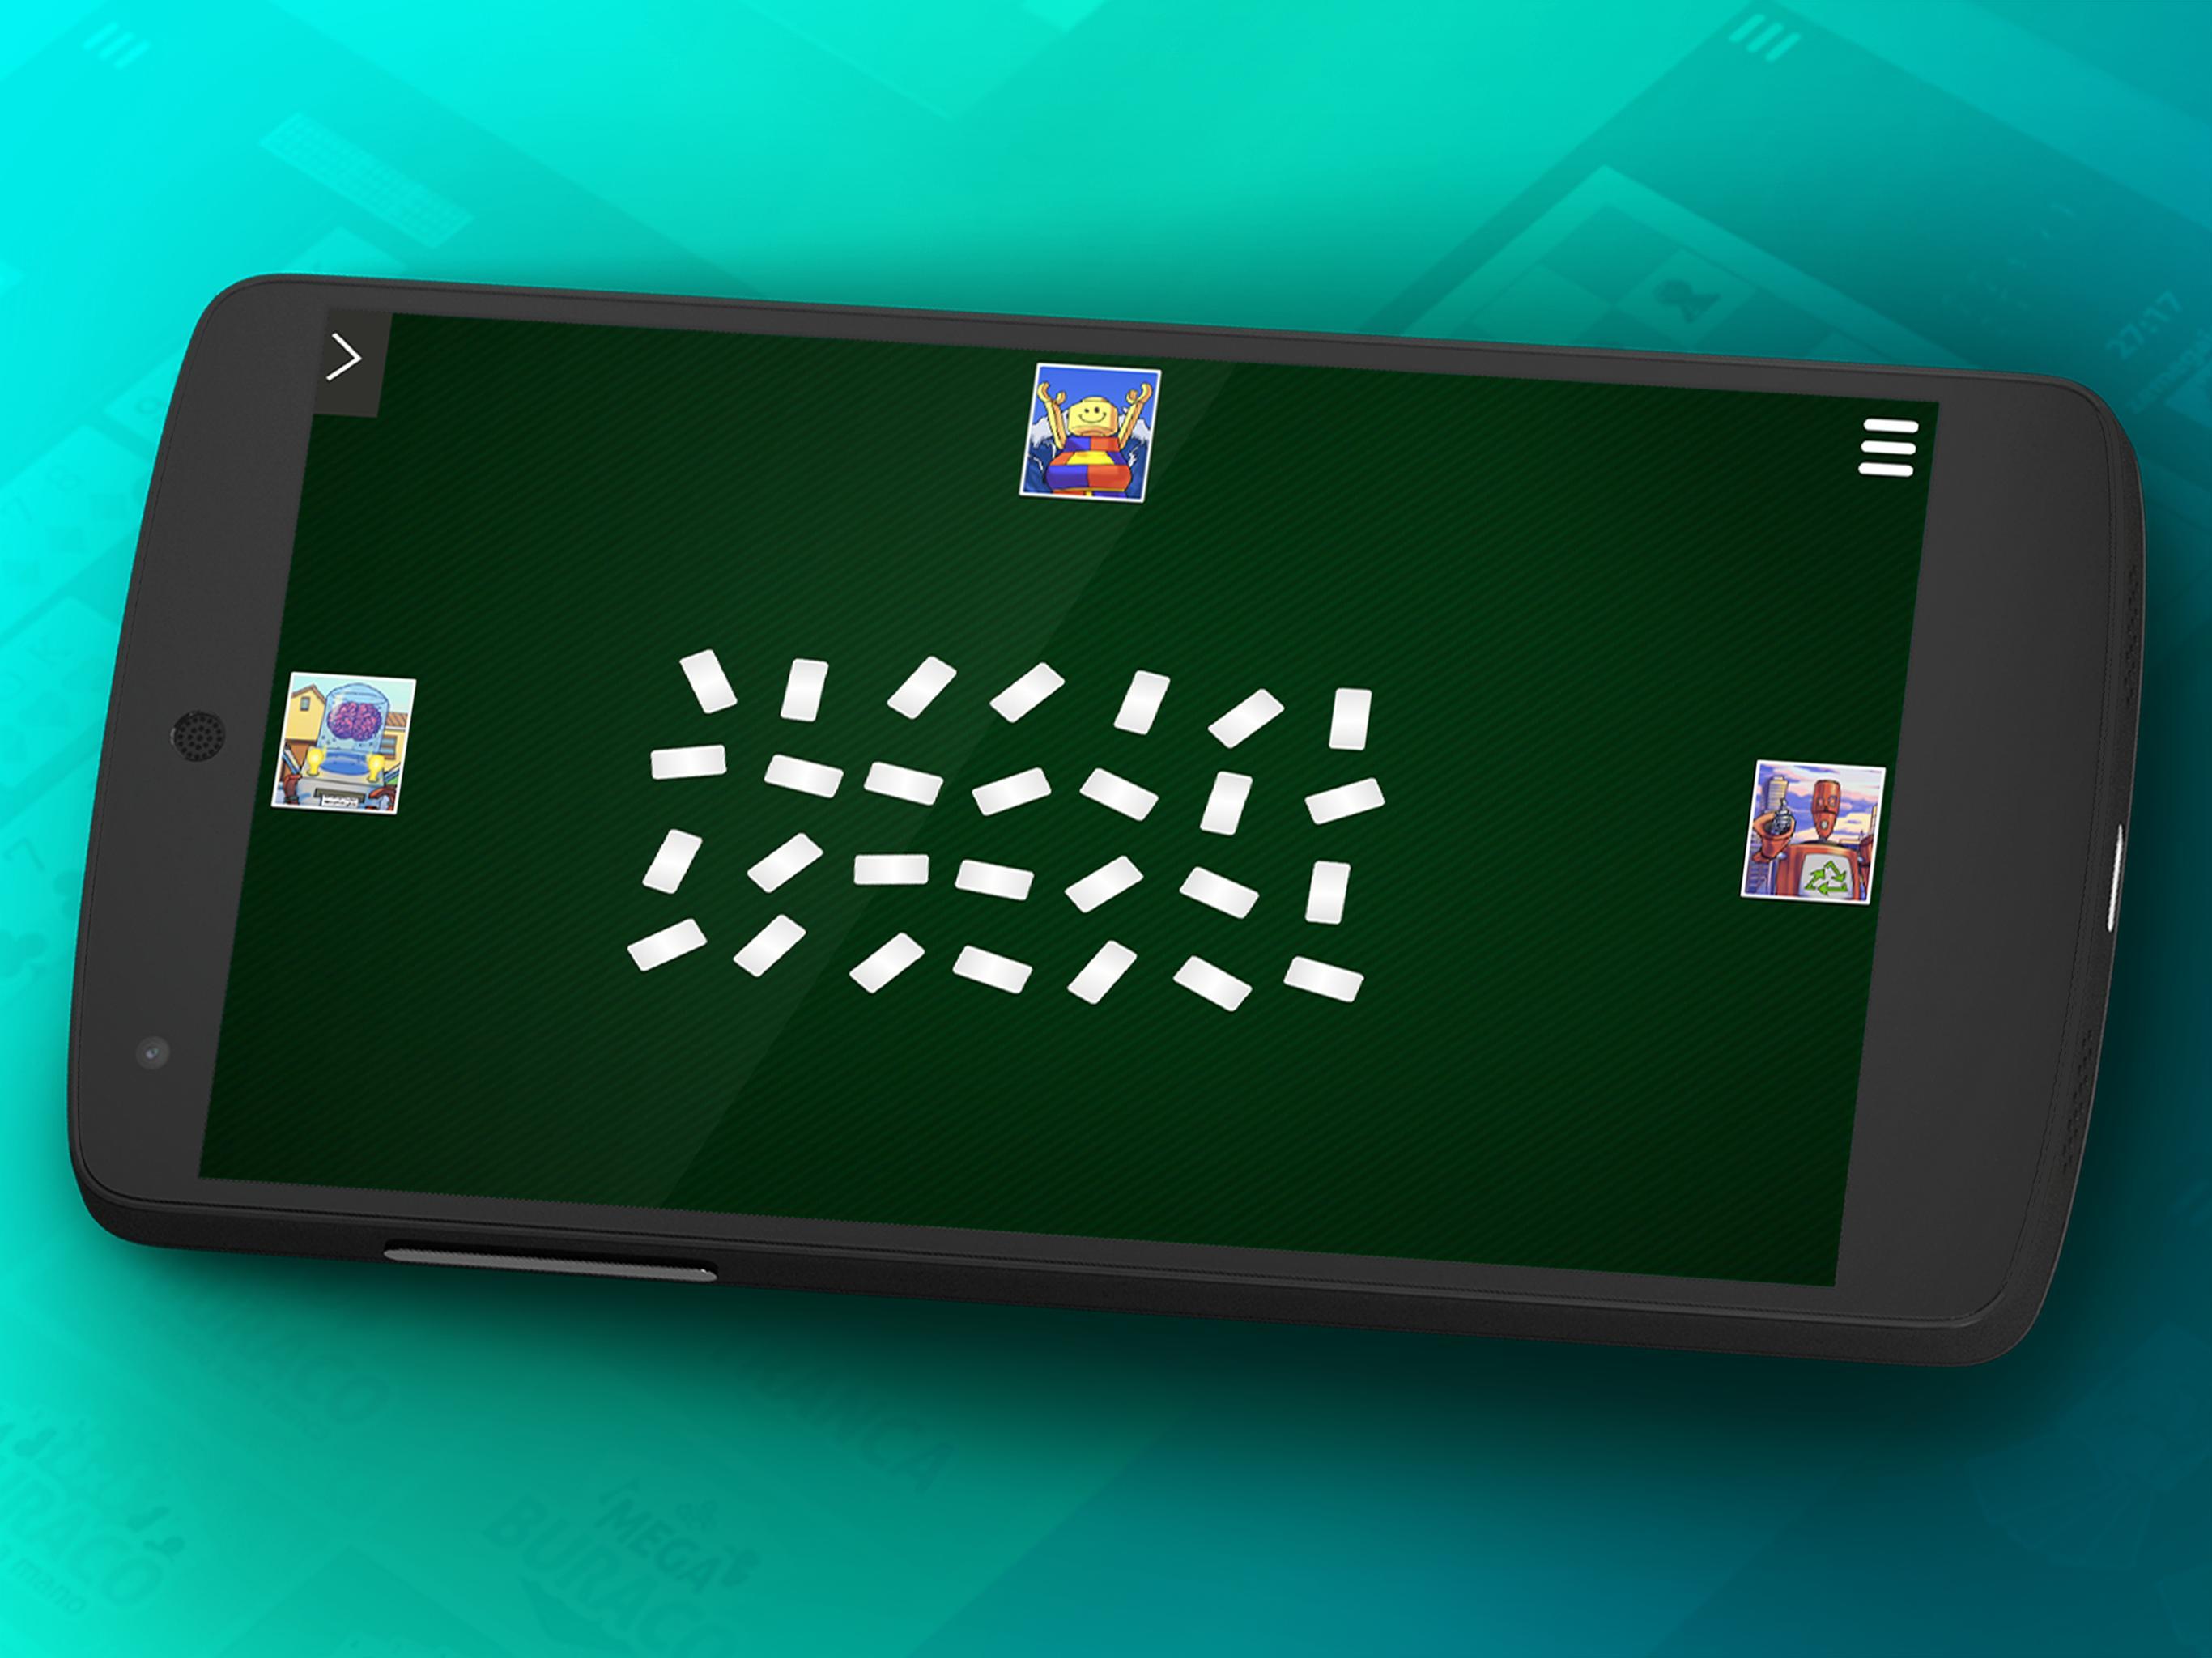 Dominoes Online - Free game 101.1.71 Screenshot 7